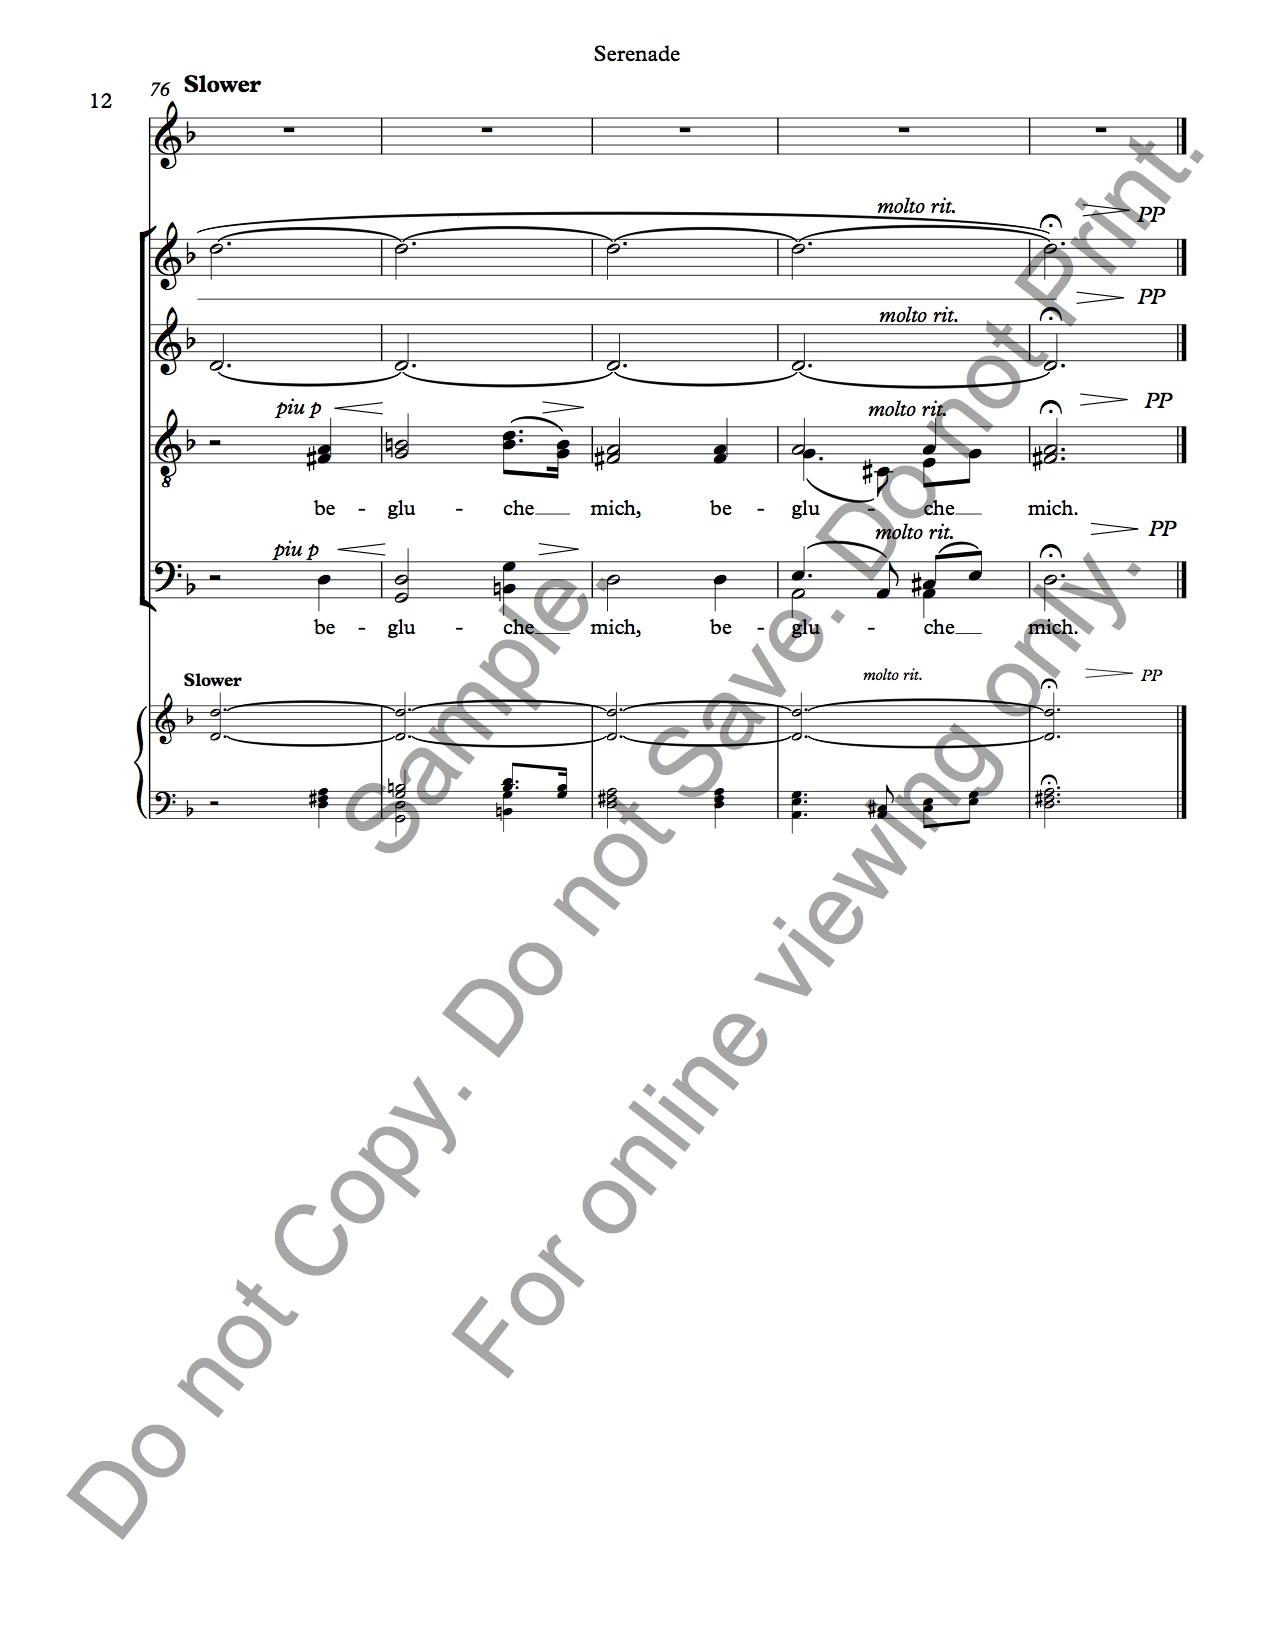 serenade03-jp12.jpg